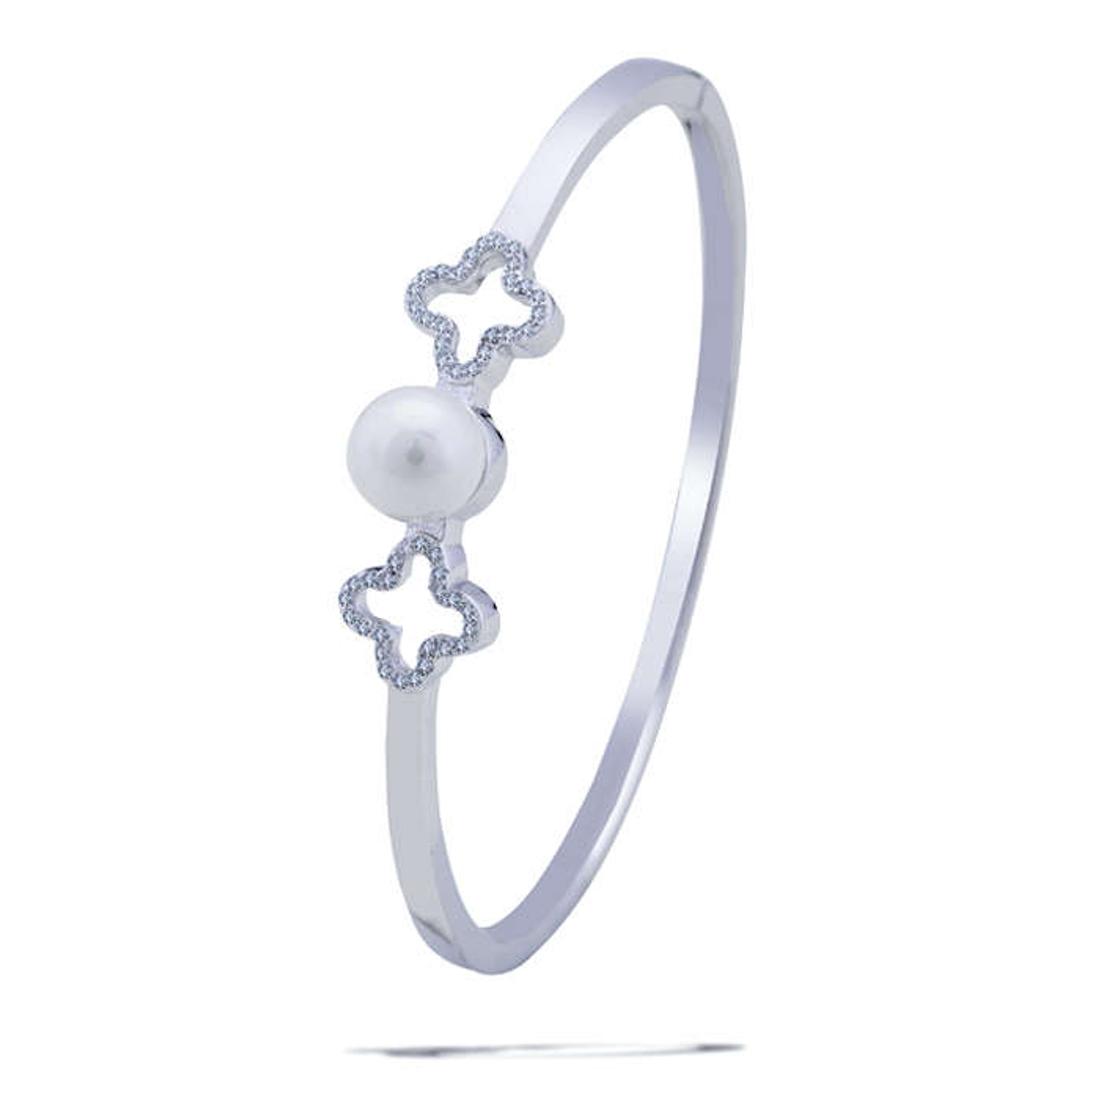 Silver Shine 92.5 Sterling SilverTwo Plus With Pearl Hard Bracelet for Women & Girls